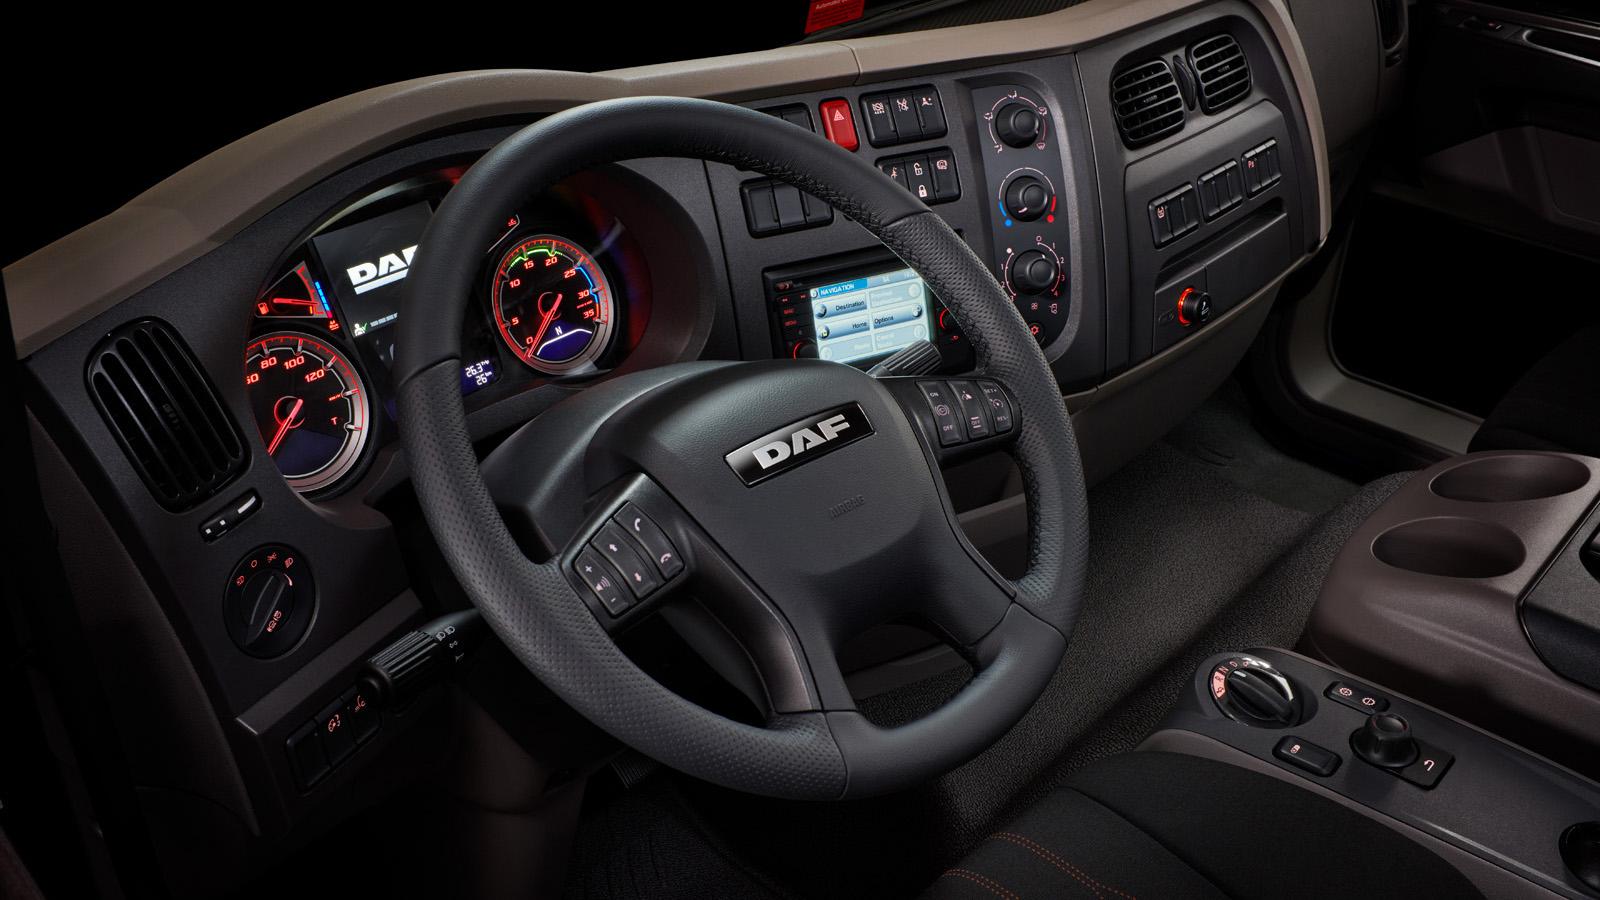 DAF LF Interior- DAF Trucks Ltd, United Kingdom